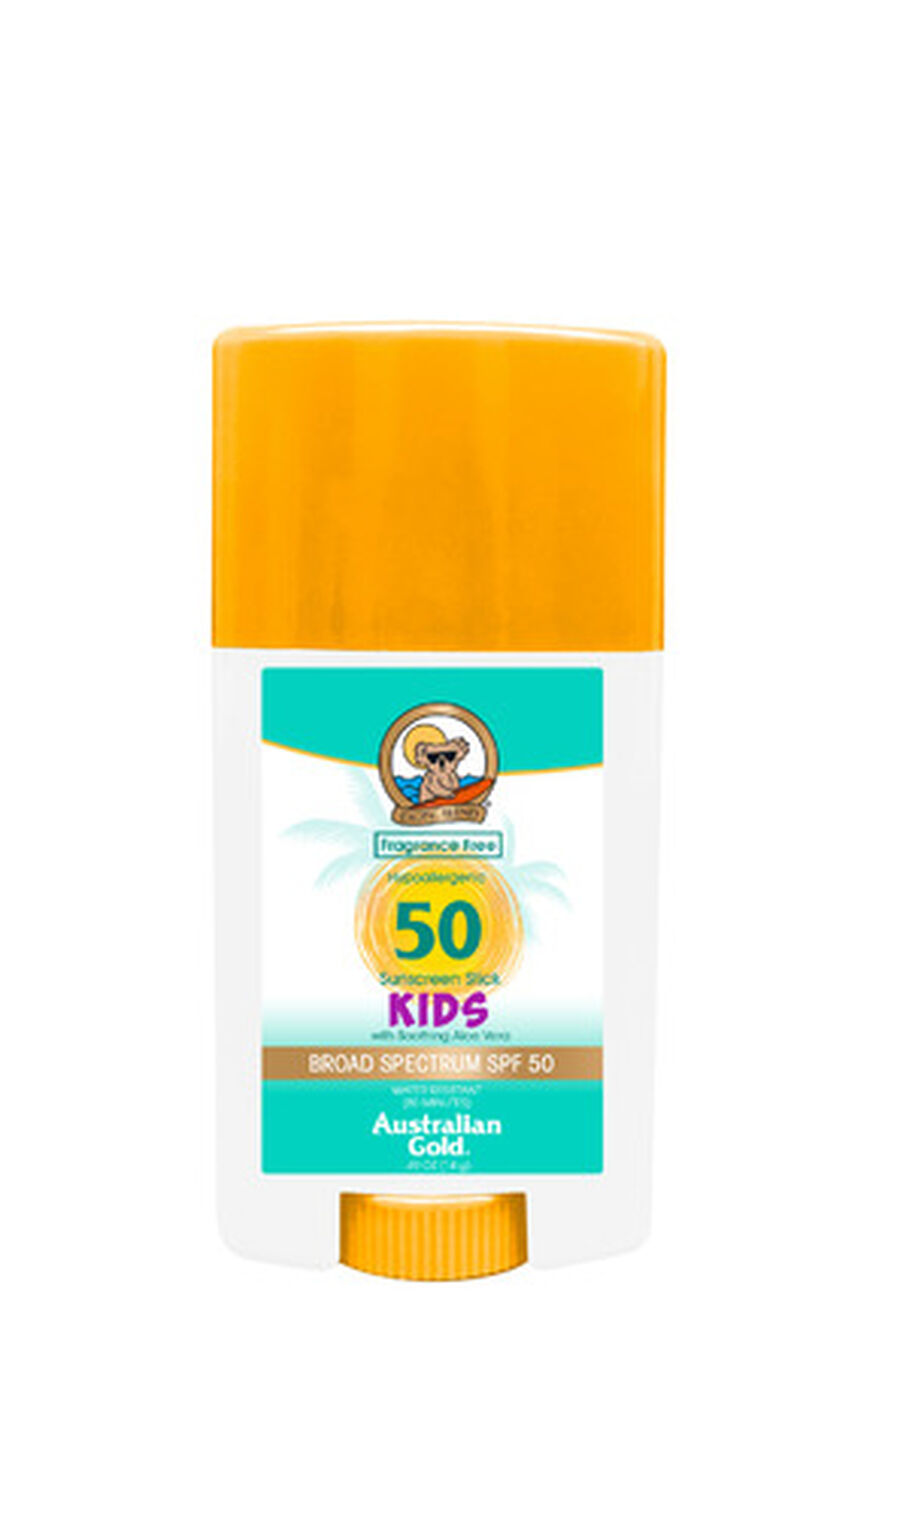 Australian Gold Kids Sunscreen Stick, SPF 50, 1.5 oz, , large image number 0